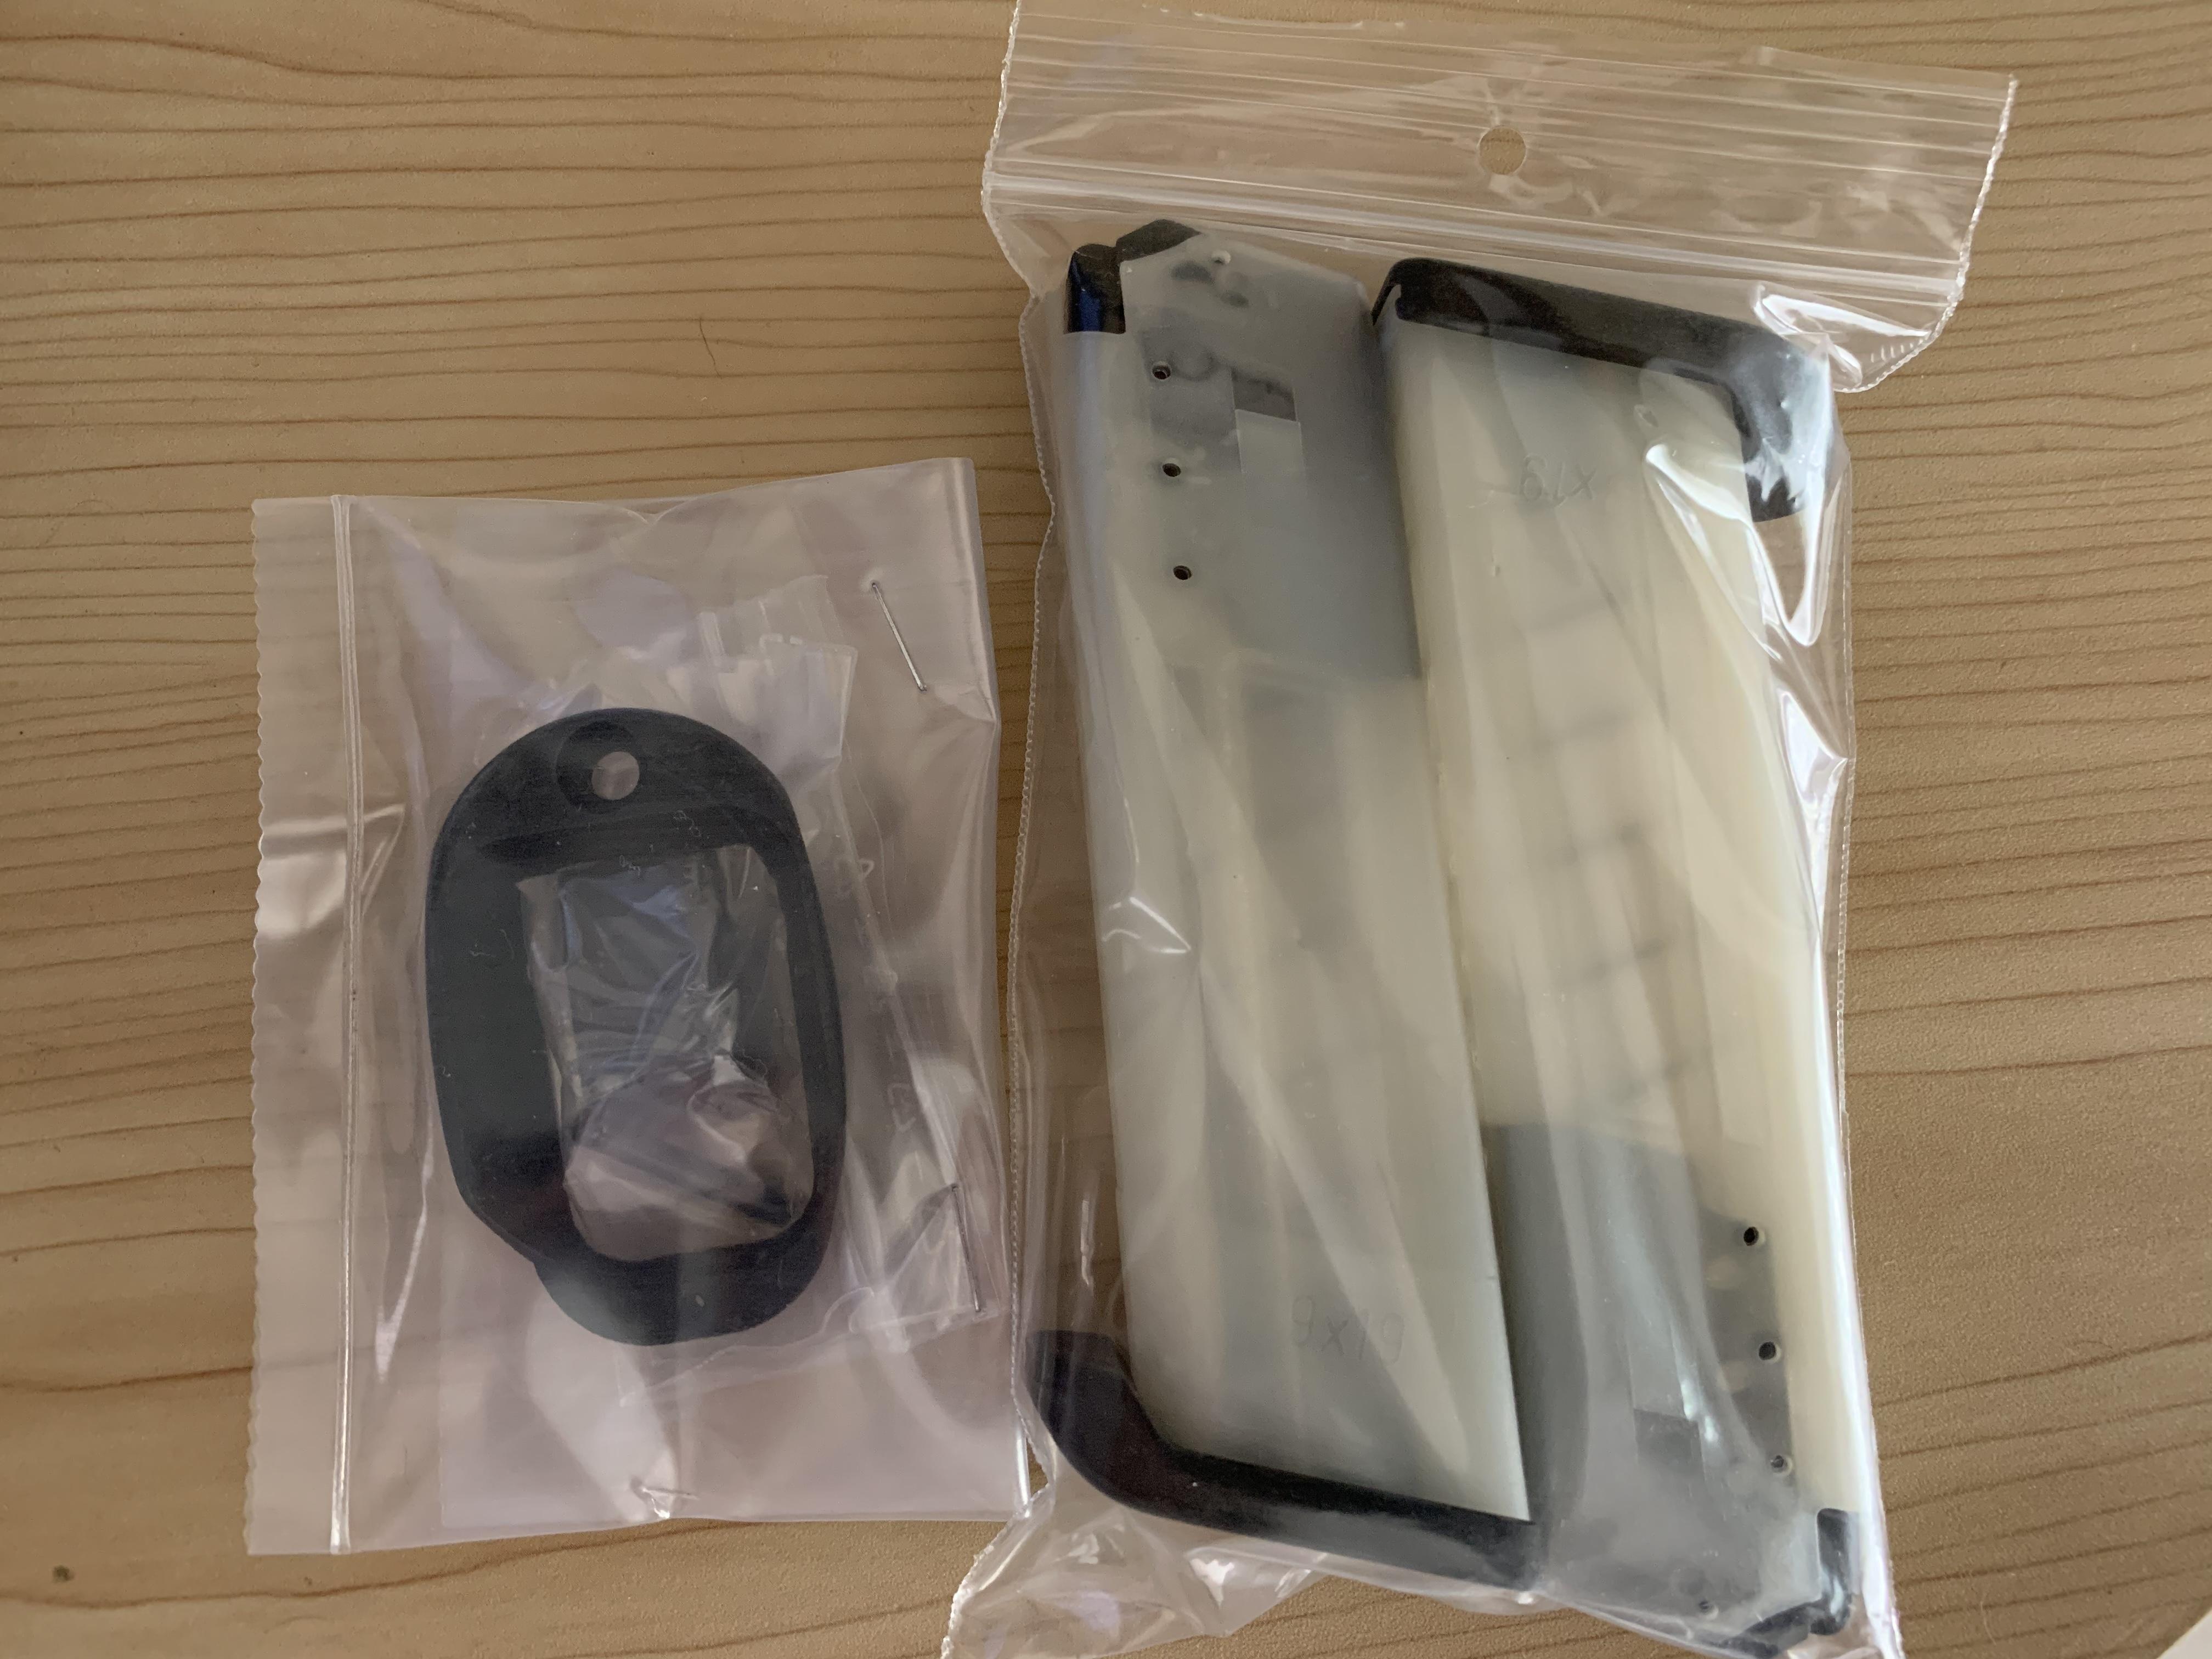 HK packaging-3beb6751-4272-4ccc-bbbe-3835b40334a2_1586013912730.jpeg